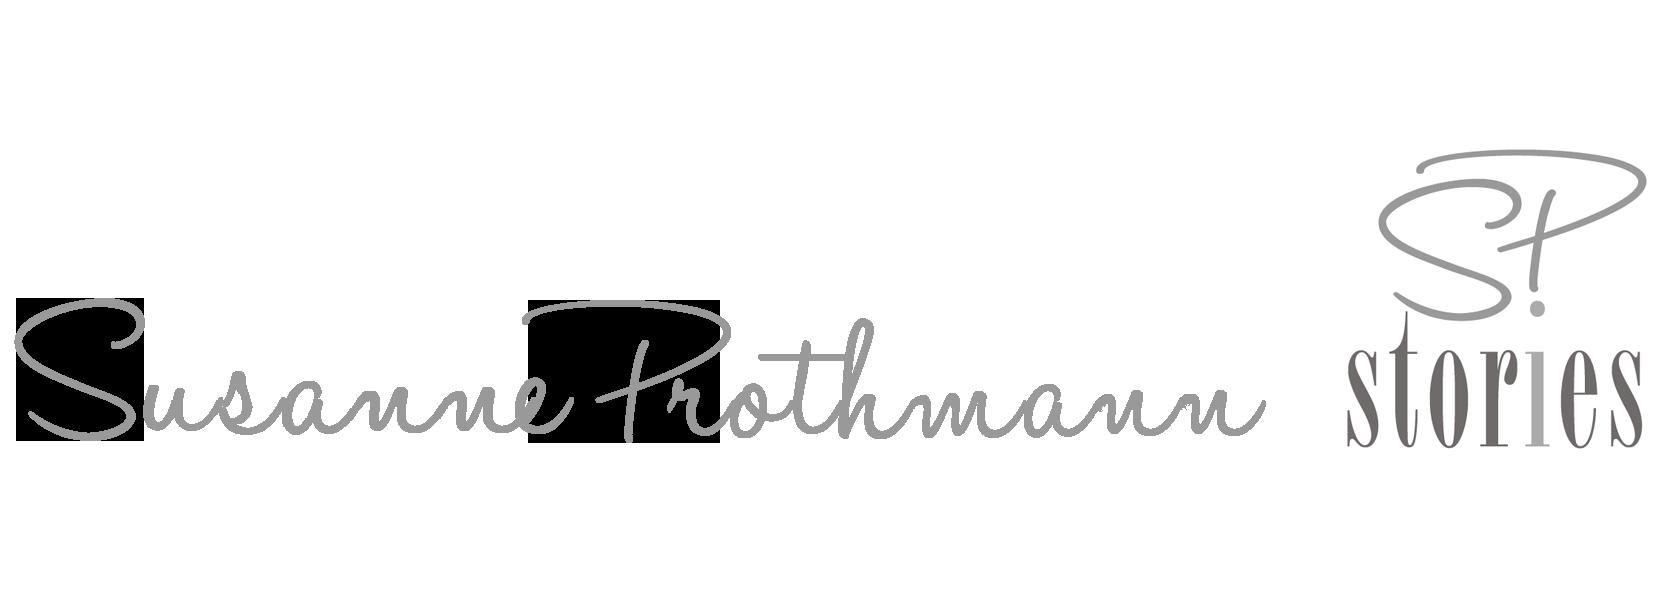 Susanne Prothmann